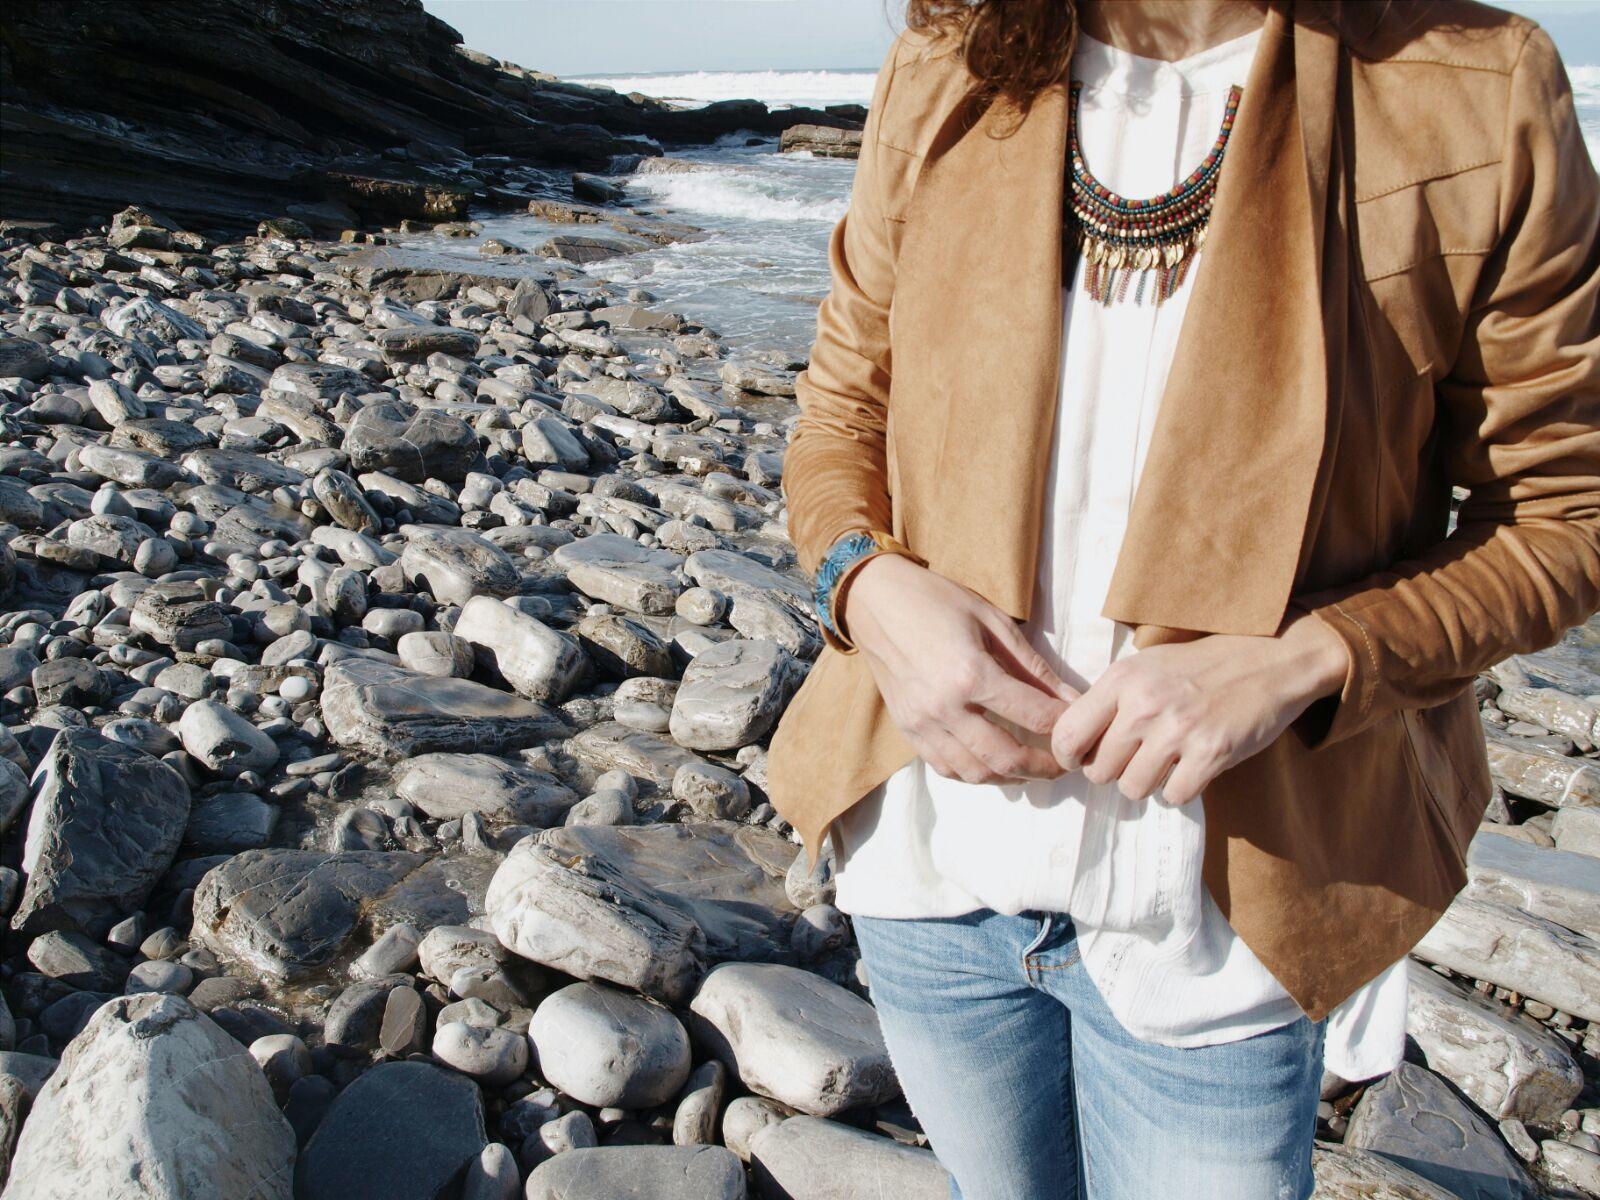 coastalandco-blog-blogger-hendaye-cotebasque-mode-fashion-scarf-ethnic-oversize-outfit-tenue-moda-mar-mer-ocean-jeans-minnetonka-bonobo-cachecache